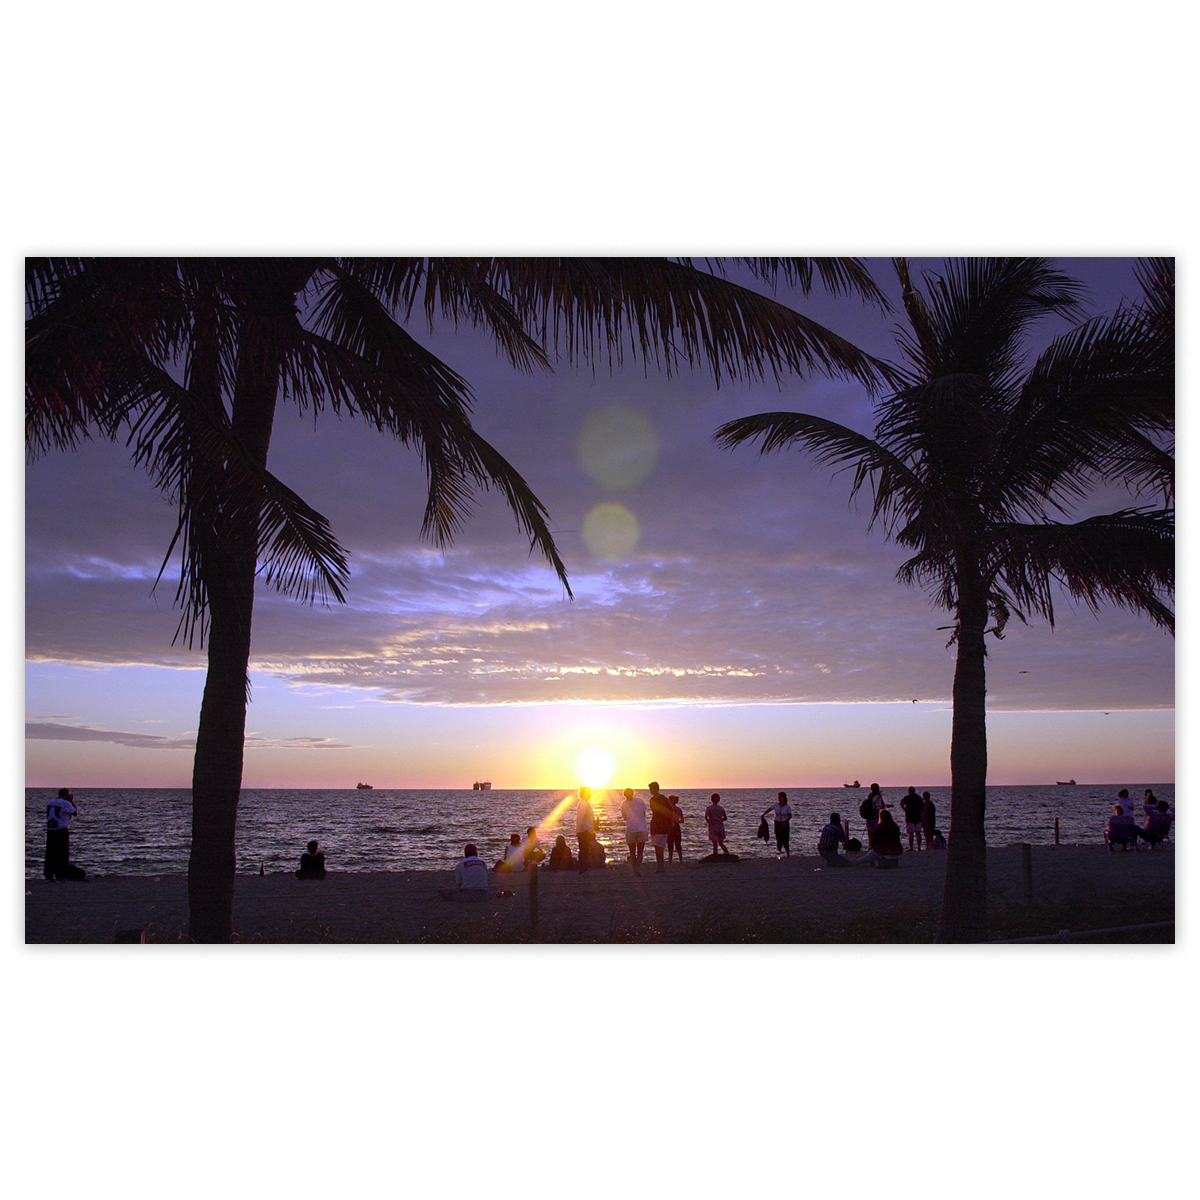 Sunrise & Sunset: Early Risers